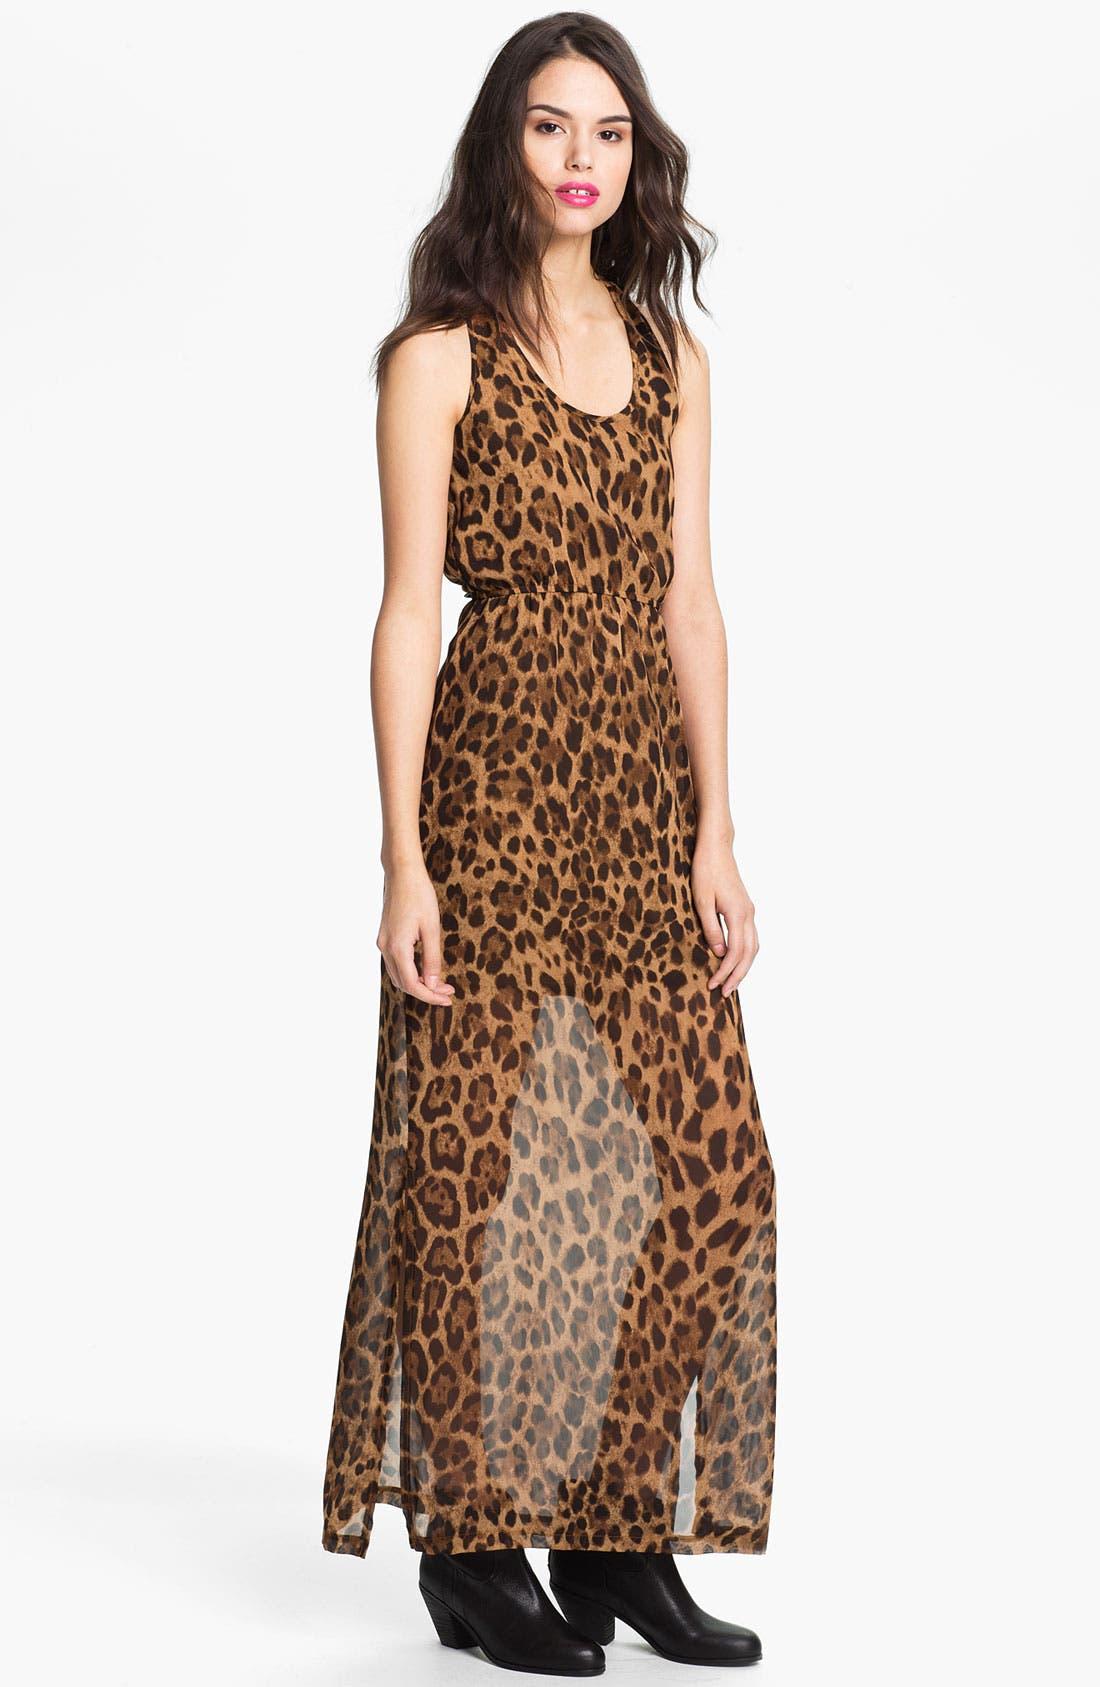 Alternate Image 1 Selected - dee elle Keyhole Back Print Chiffon Maxi Dress (Juniors)